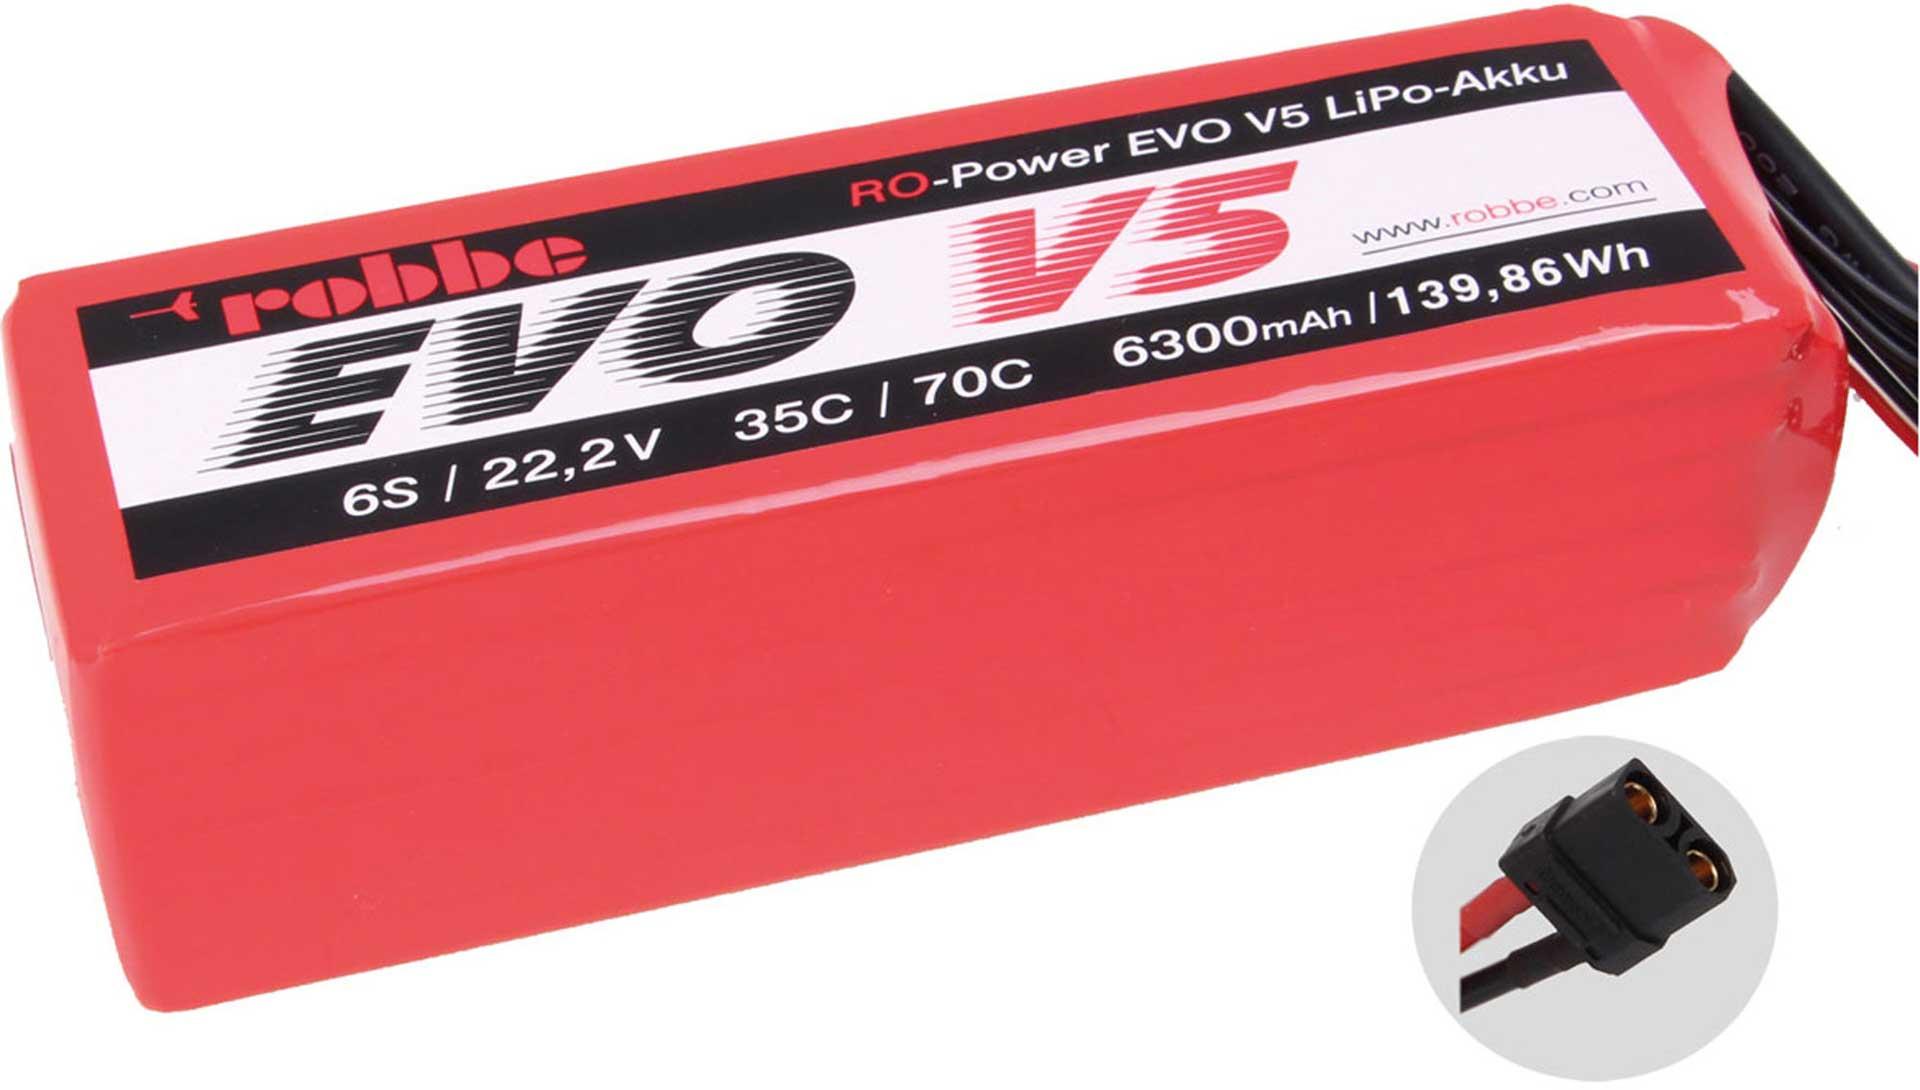 ROBBE RO-POWER EVO V5 35(70)C 22,2 VOLT 6S 6300MAH LIPO BATTERY